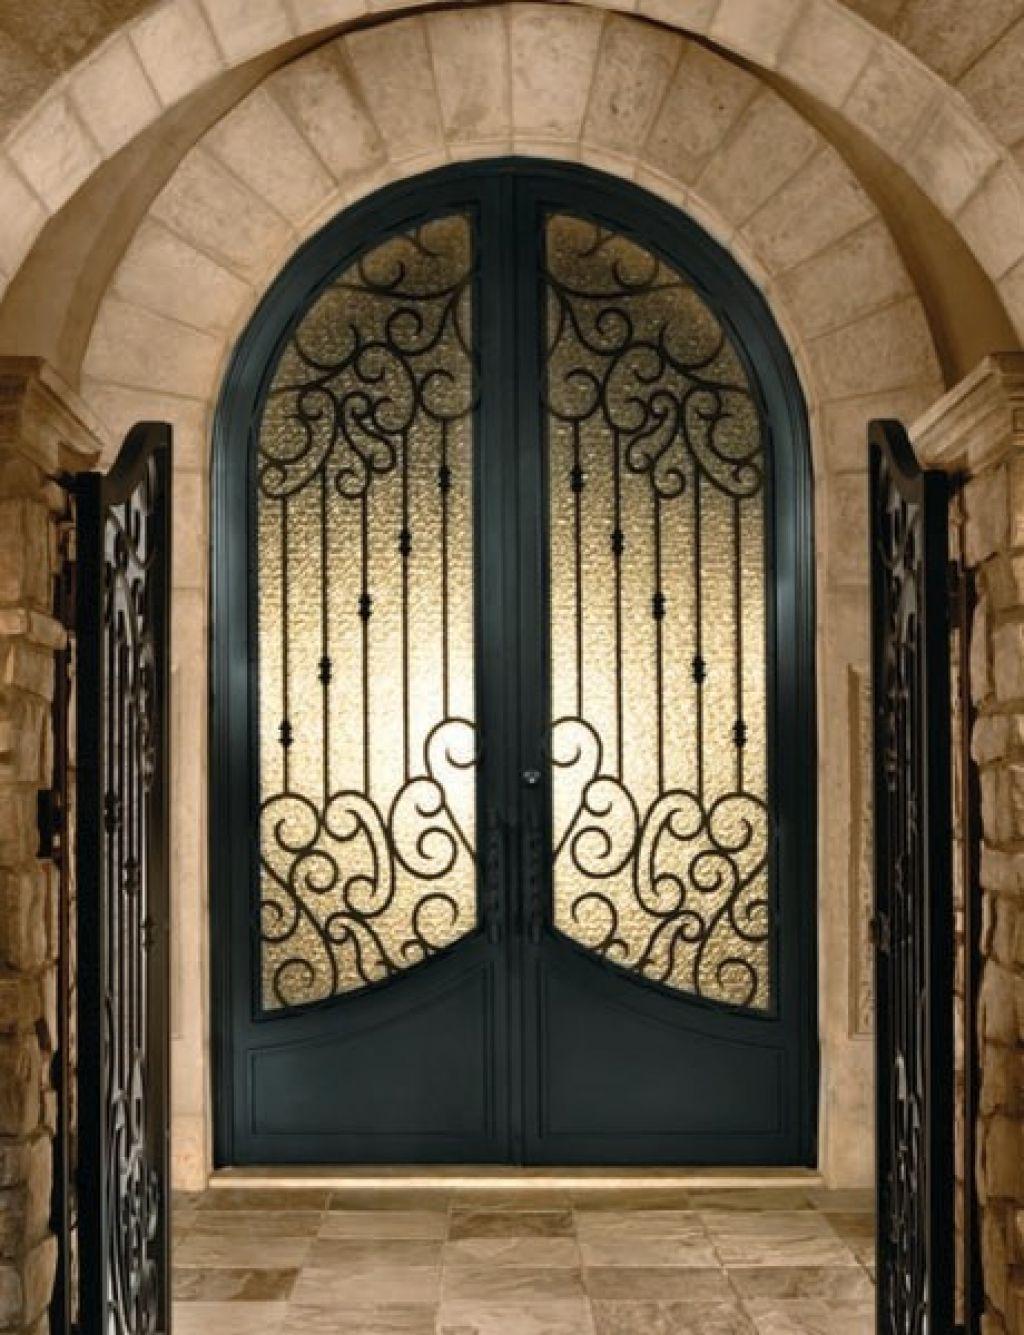 Spanish Wrought Iron Window Grills | Home Design Interior ...